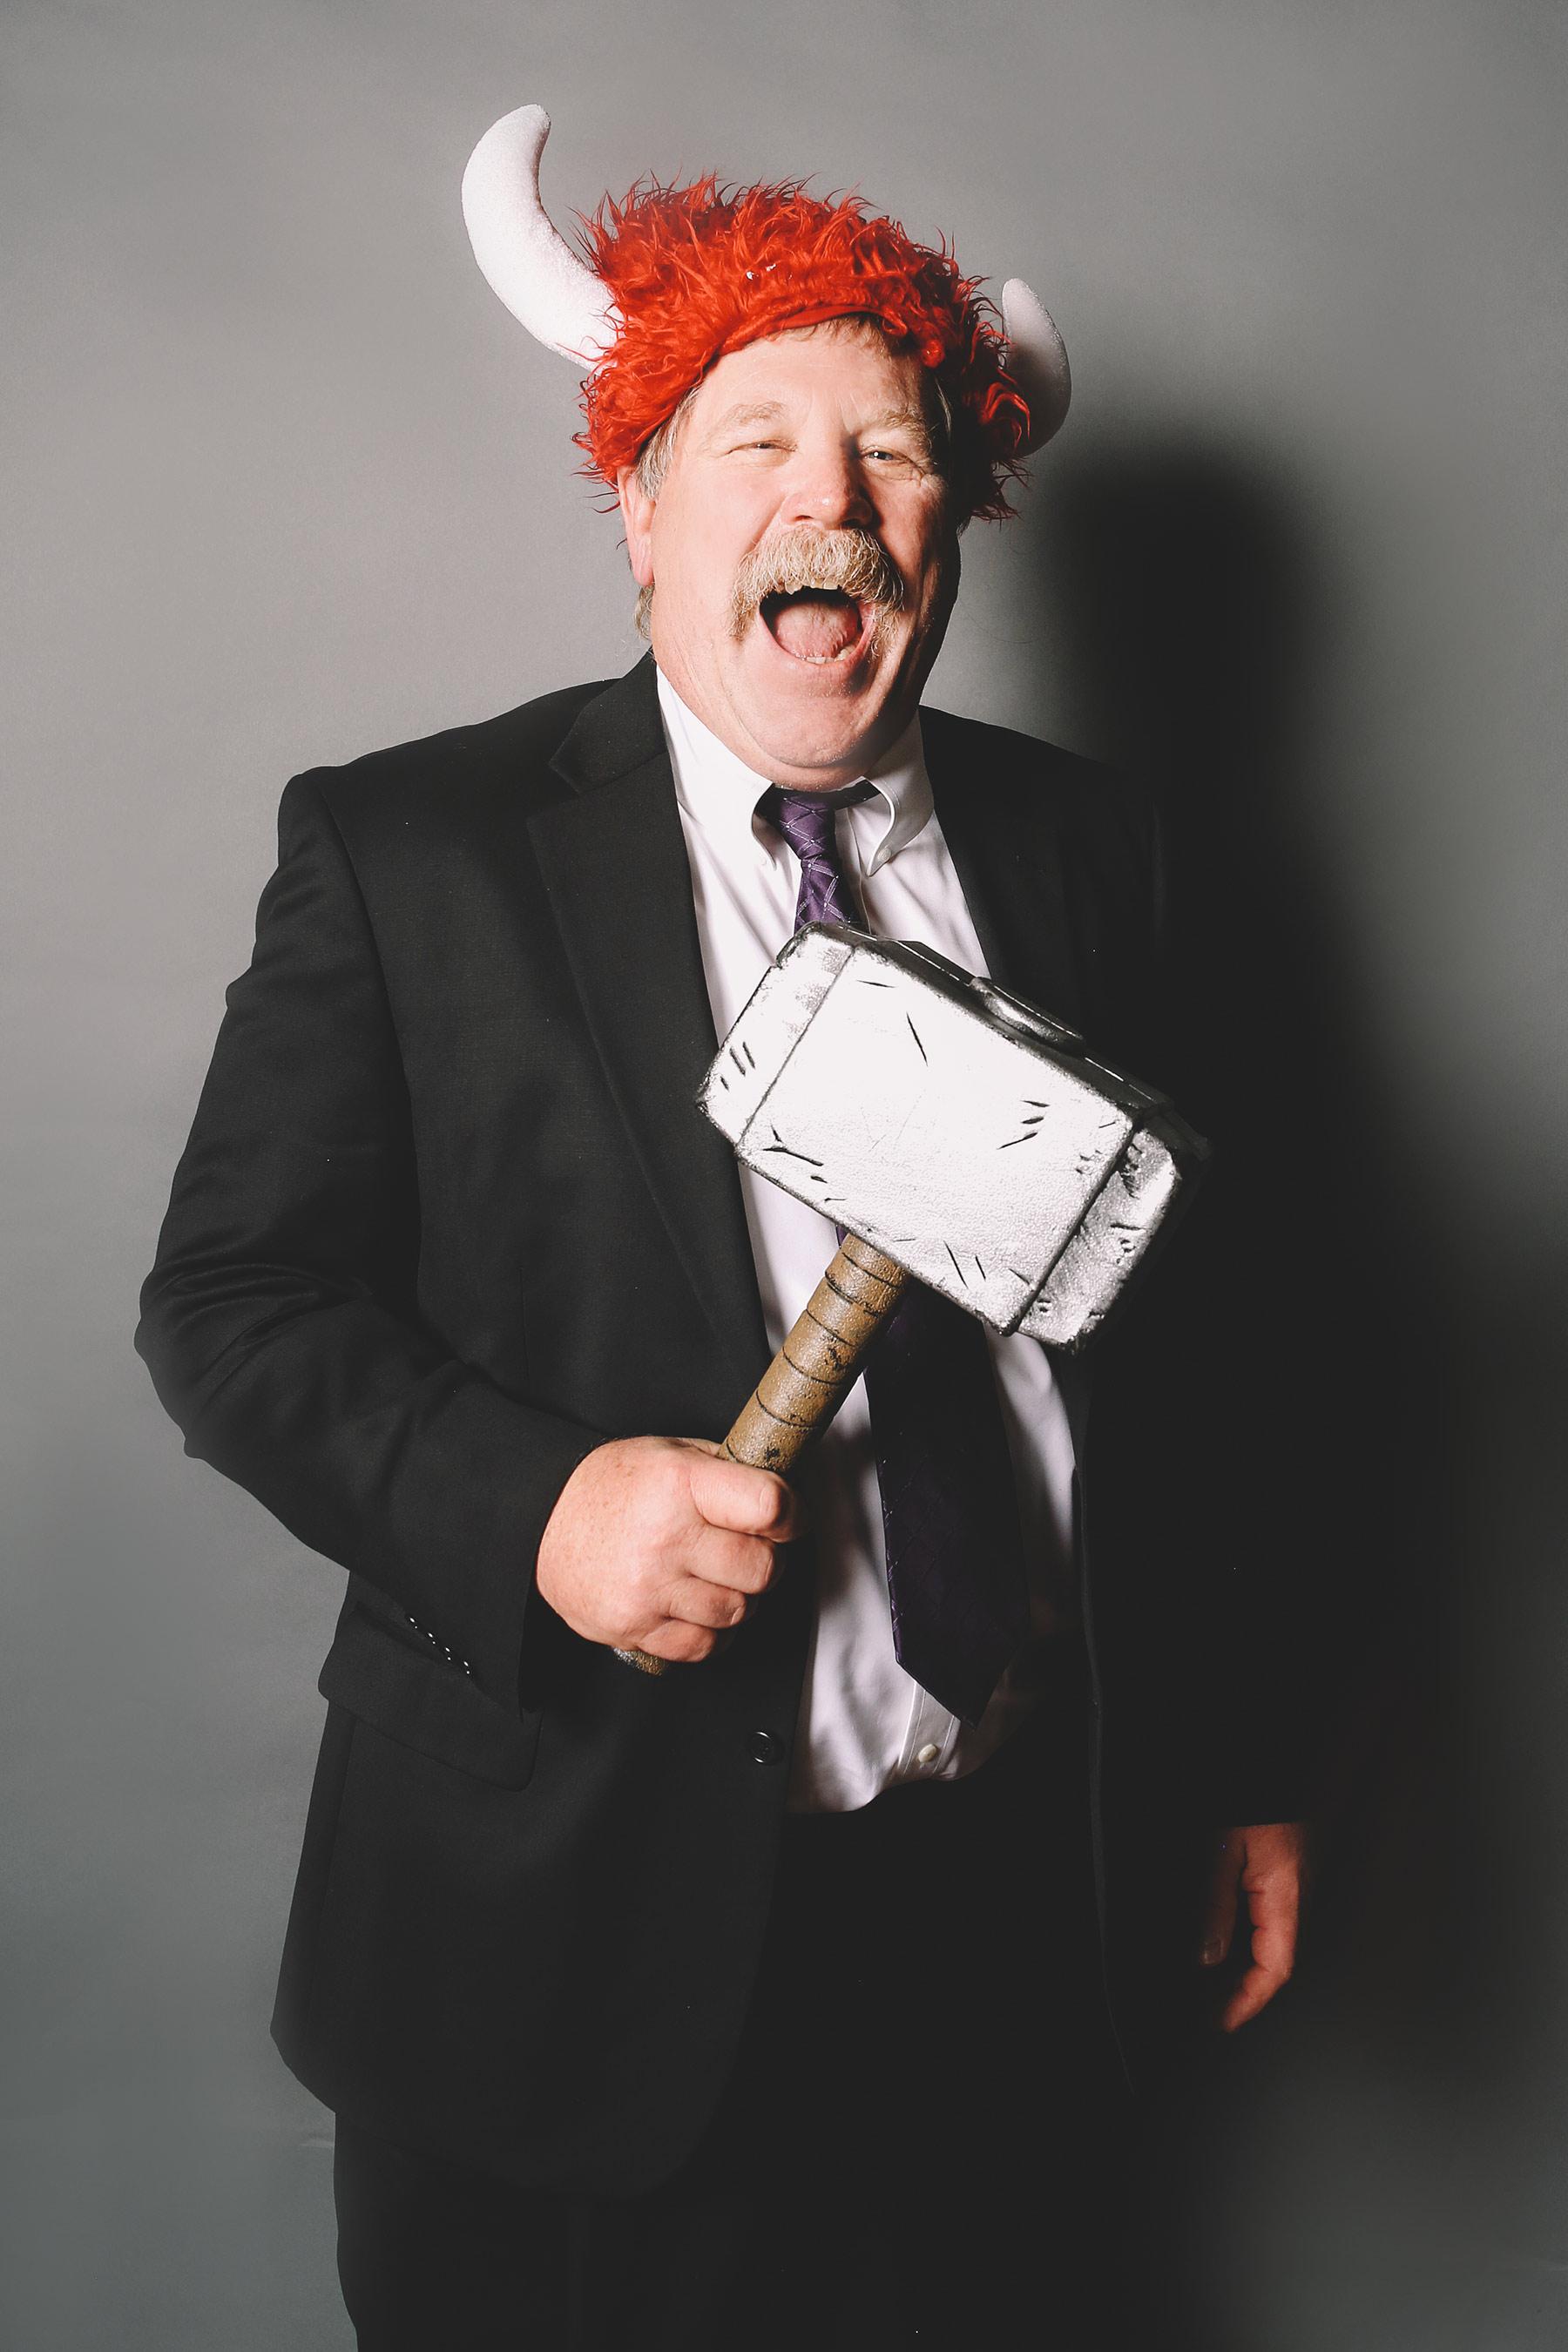 Vick-Photography-Crazy-Cam-Photo-Booth-Grandpa-Viking.jpg